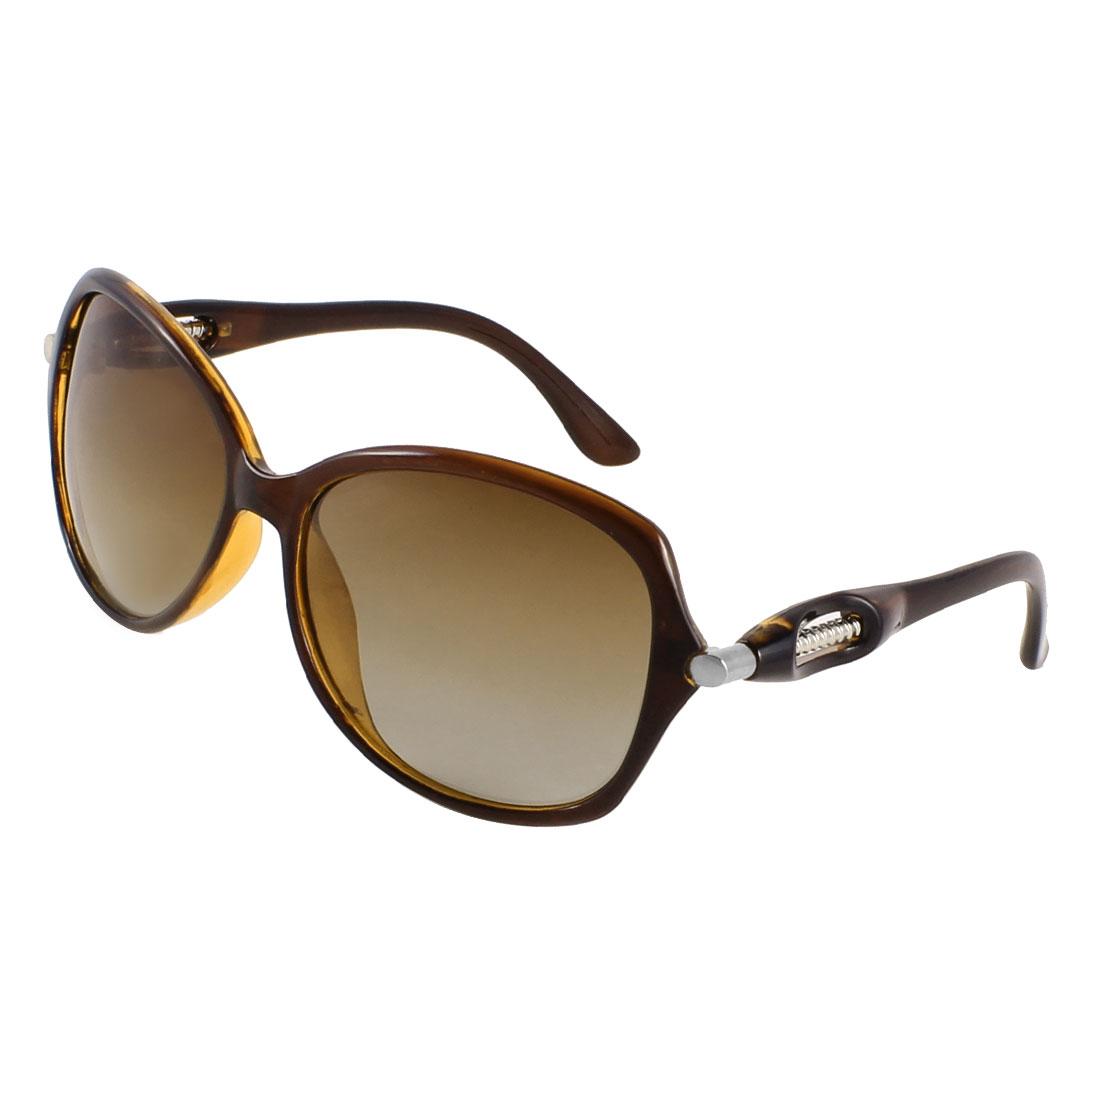 Water Drop Shape Brown Lens Single Bridge Polarized Sunglasses for Ladies